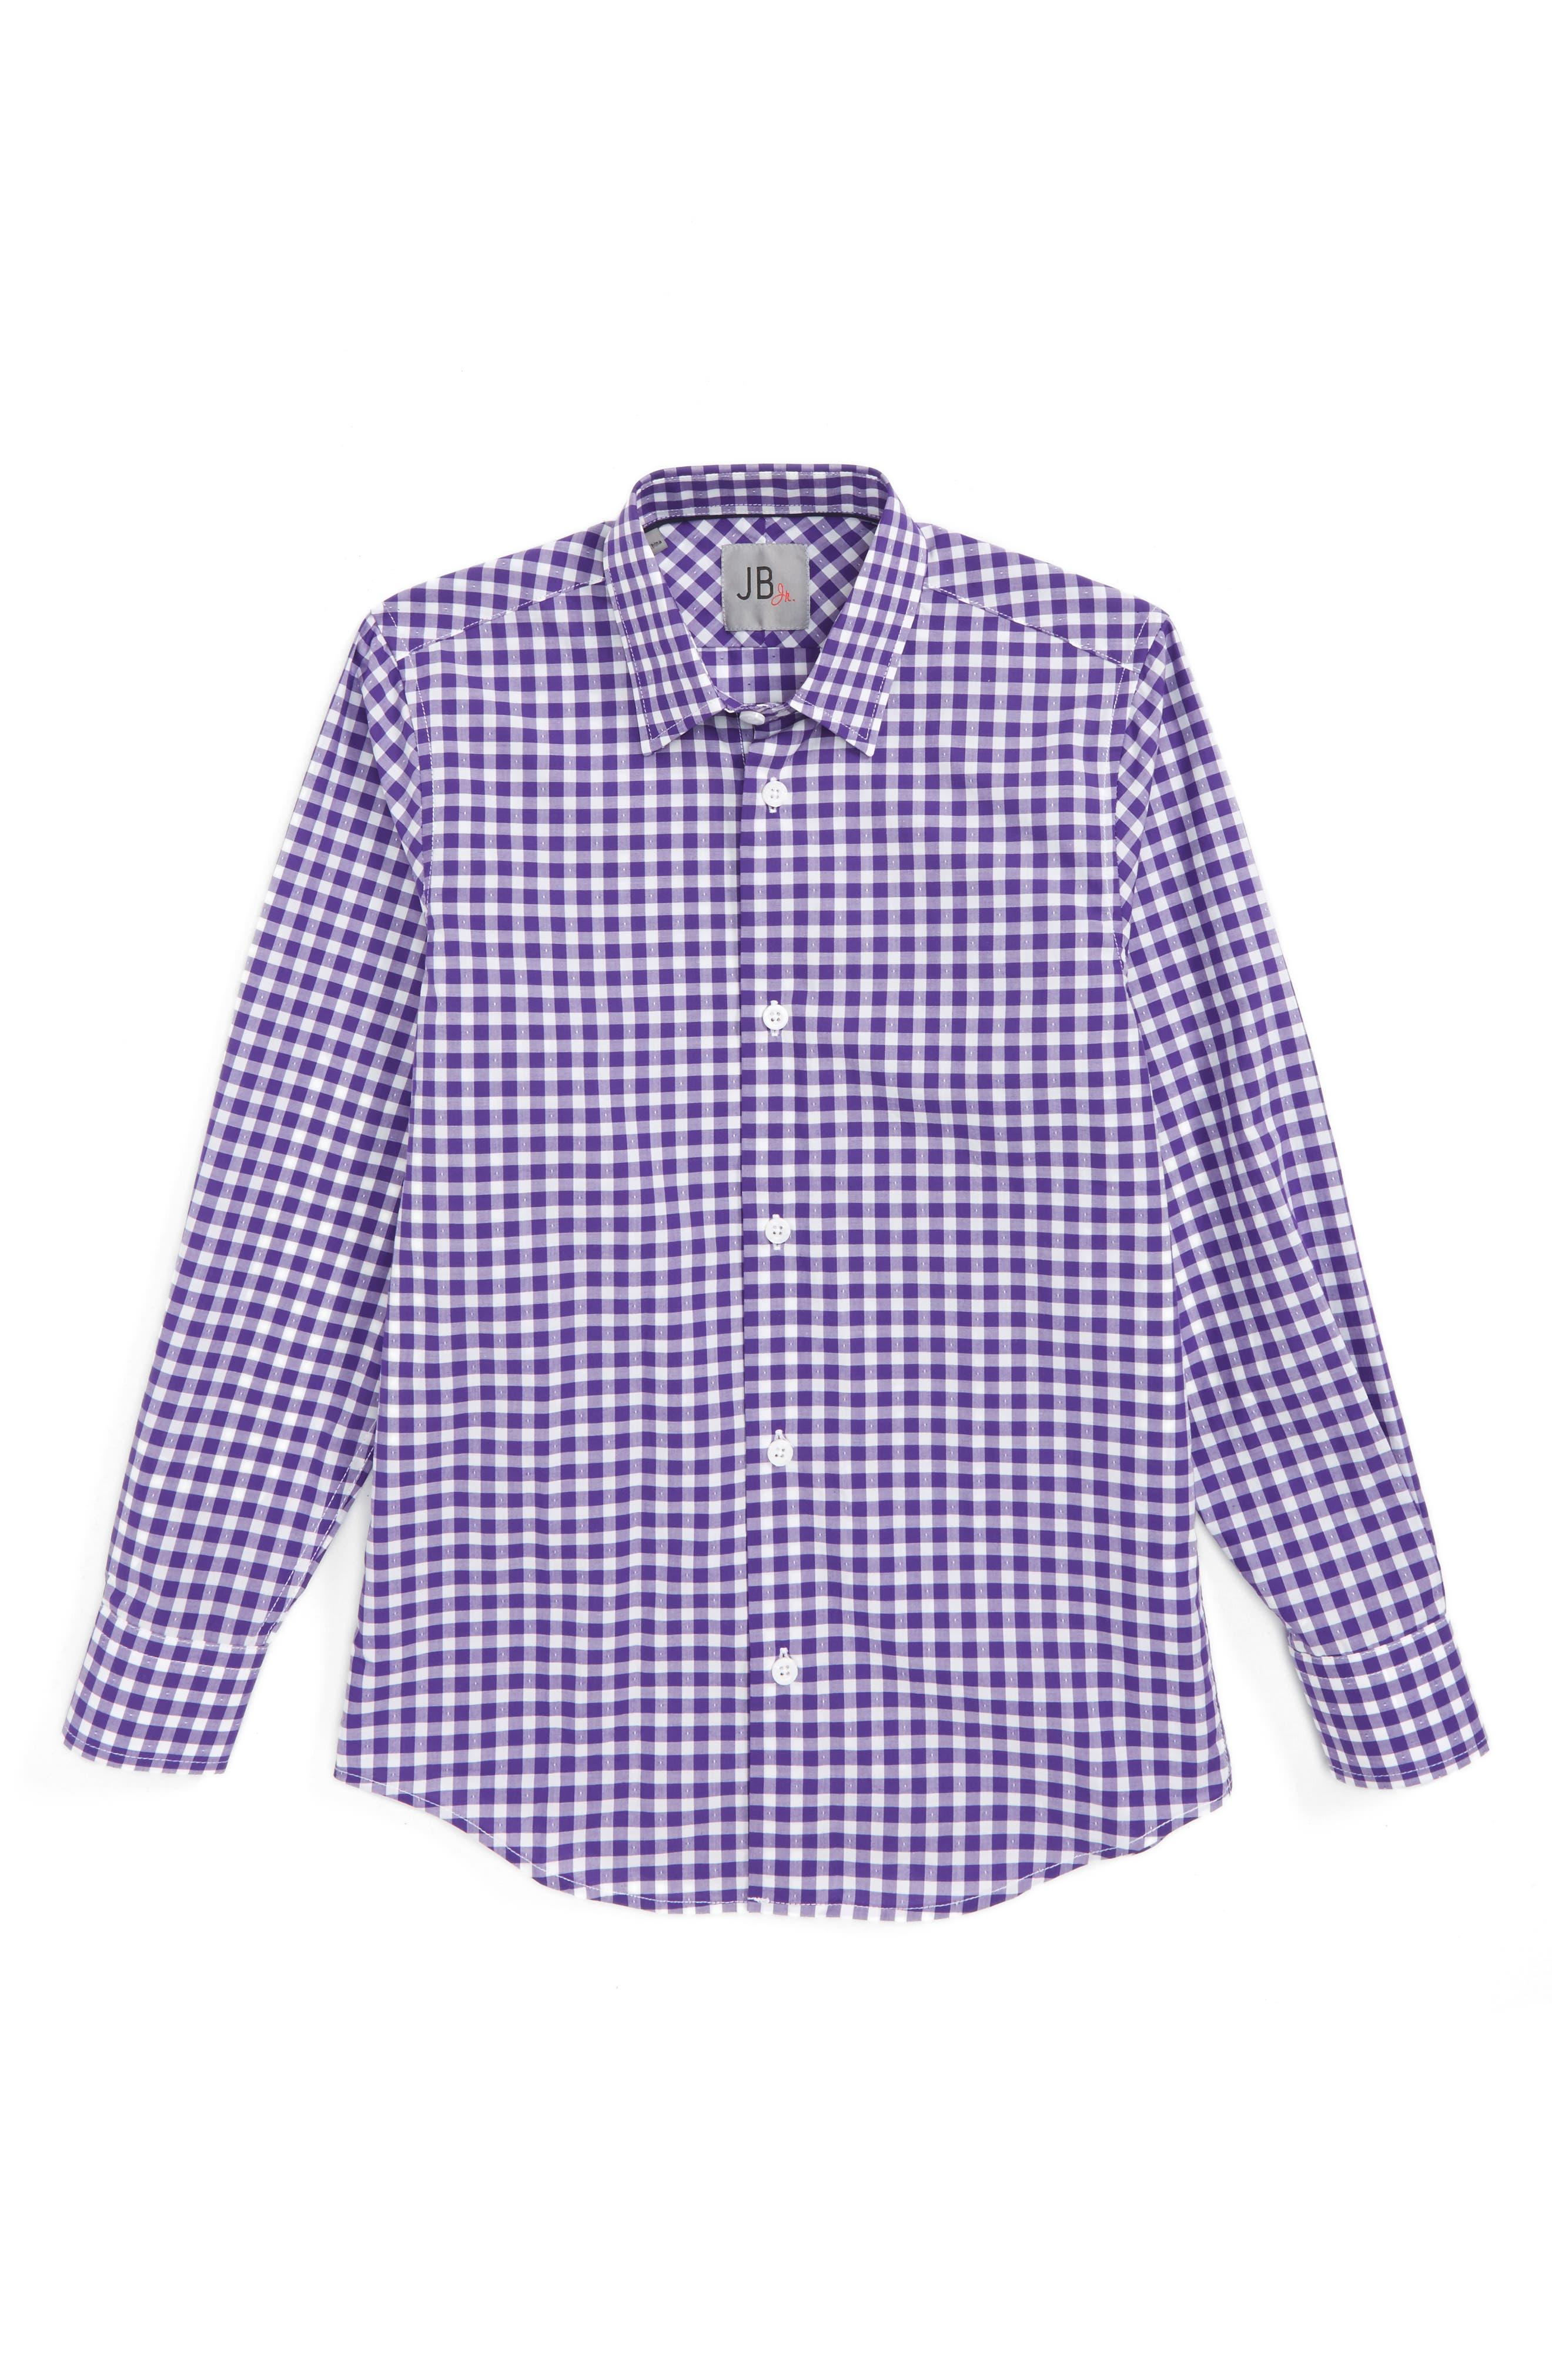 Alternate Image 1 Selected - JB Jr Check Dress Shirt (Big Boys)